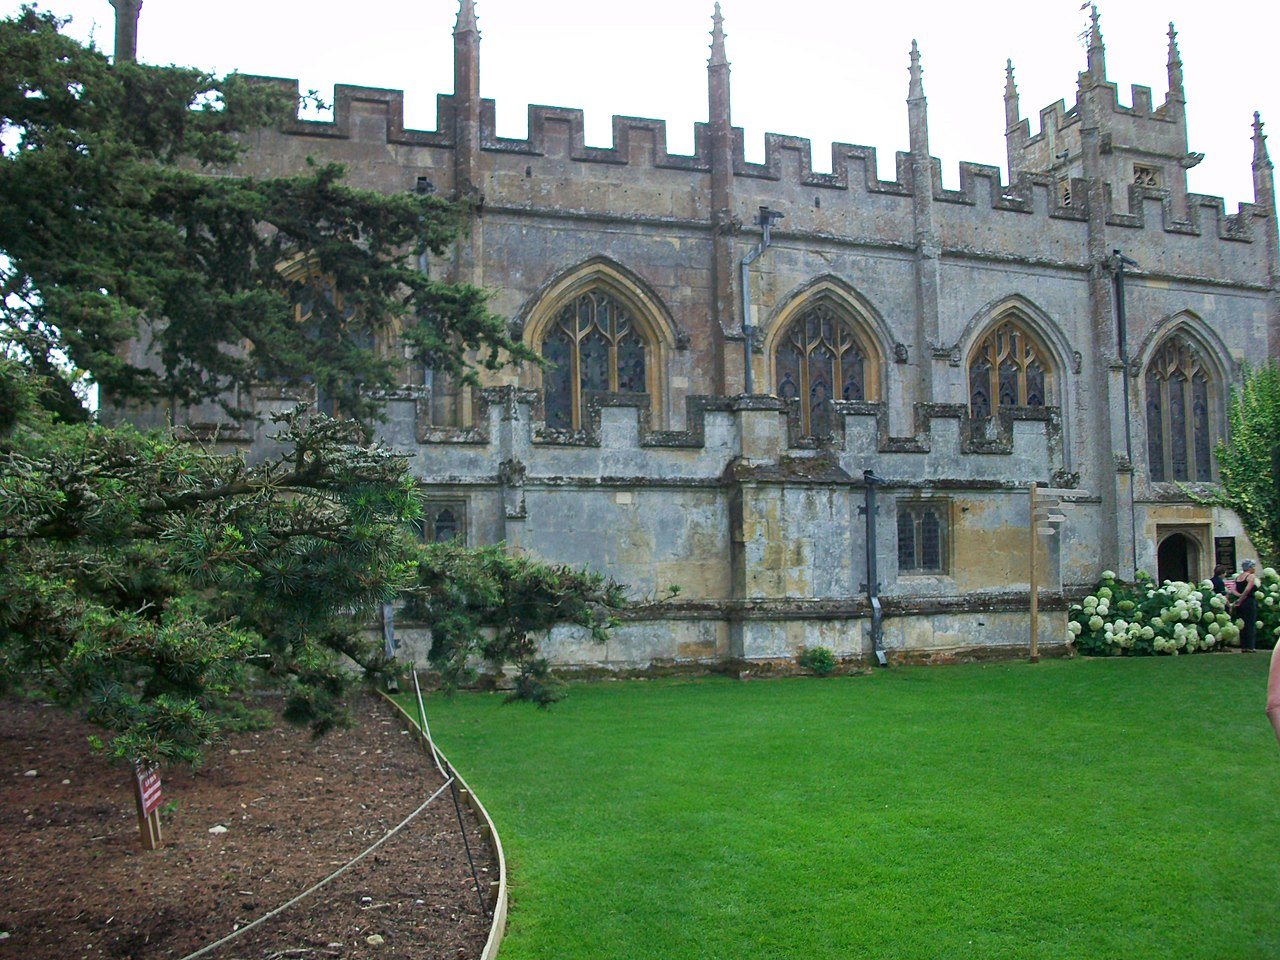 File:Side view of St Marys Church, Sudeley Castle.JPG ...